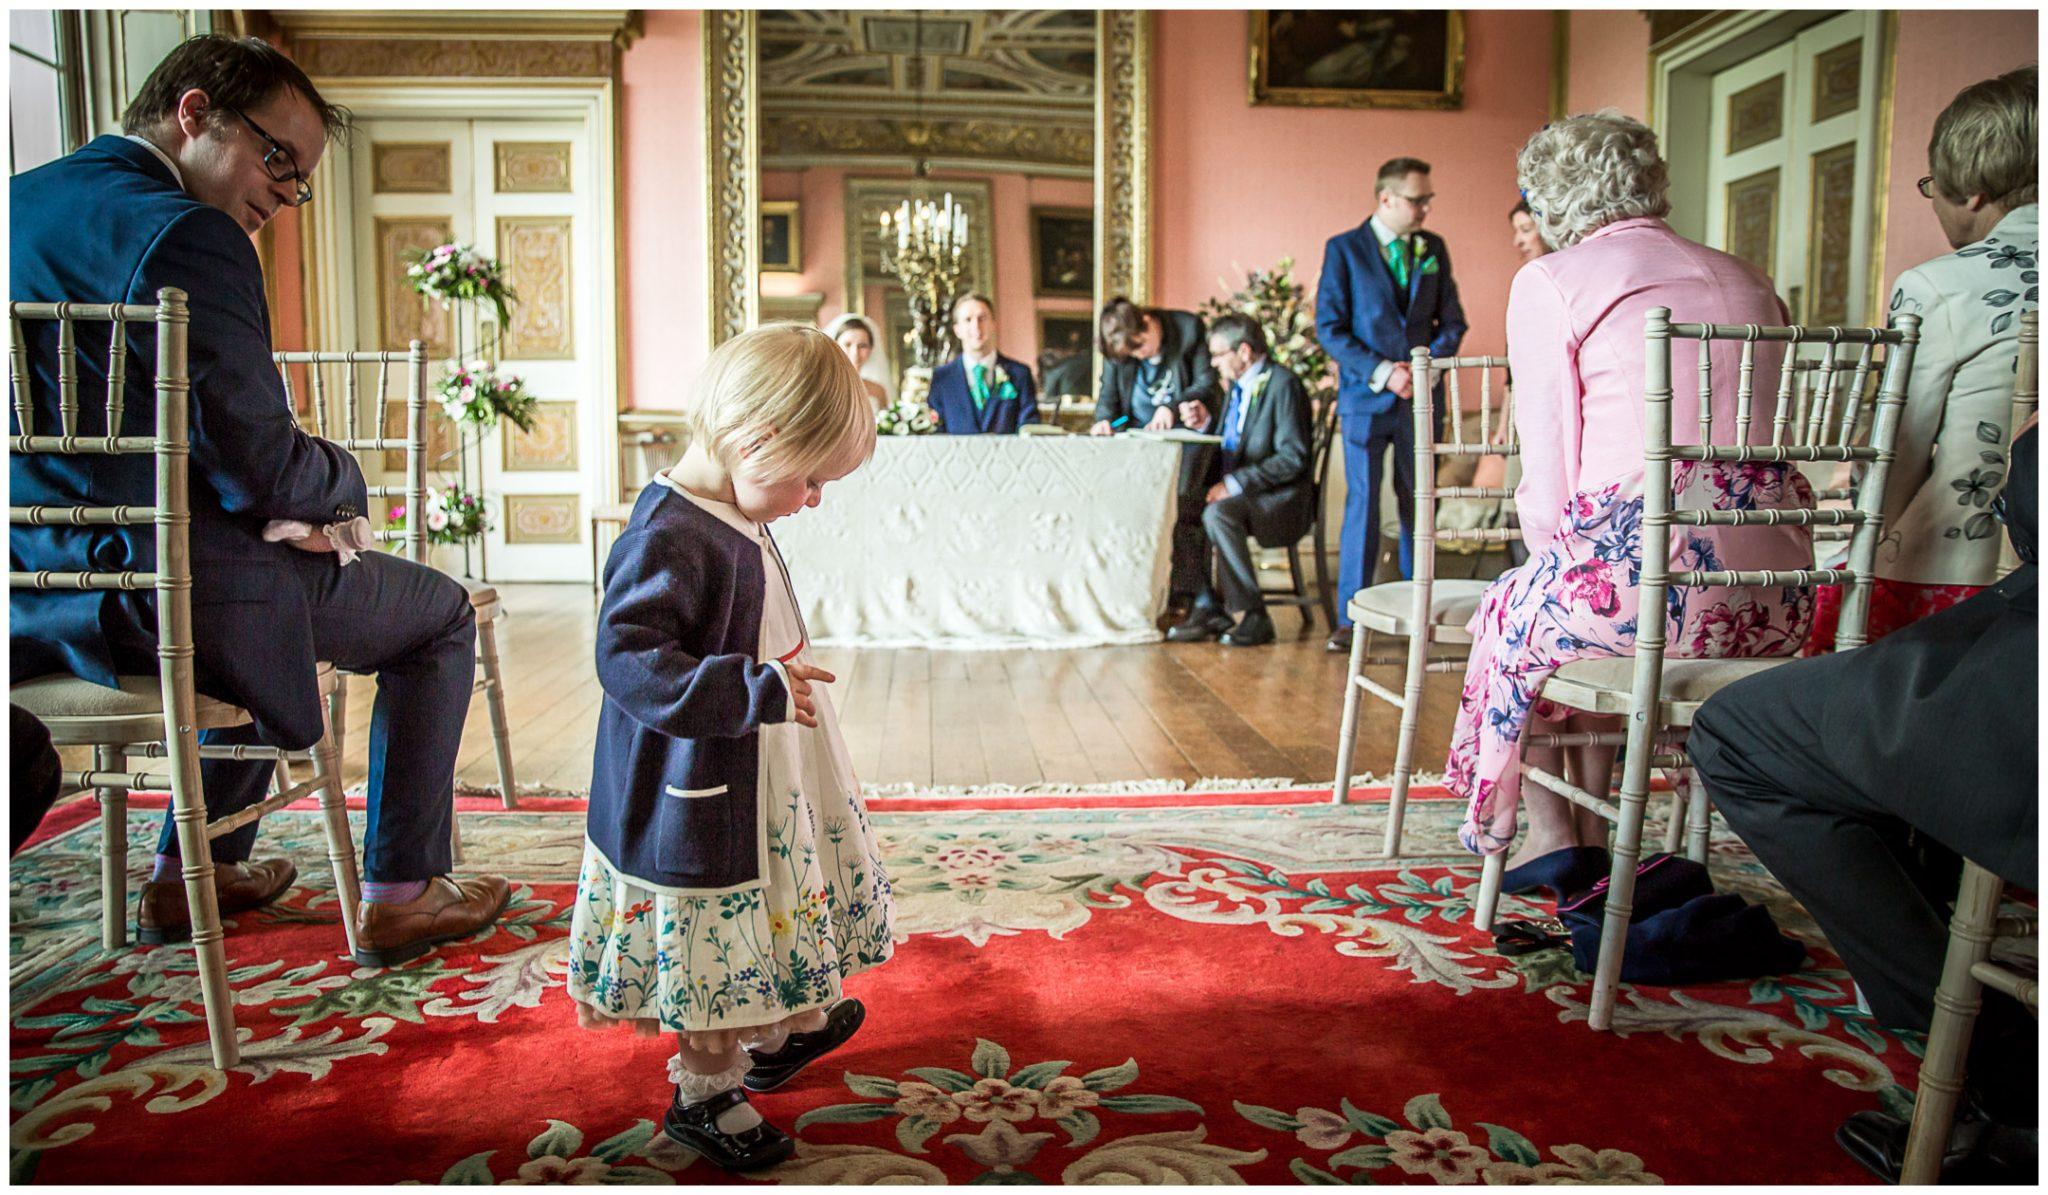 Avington Park wedding photography signing of register in ballroom